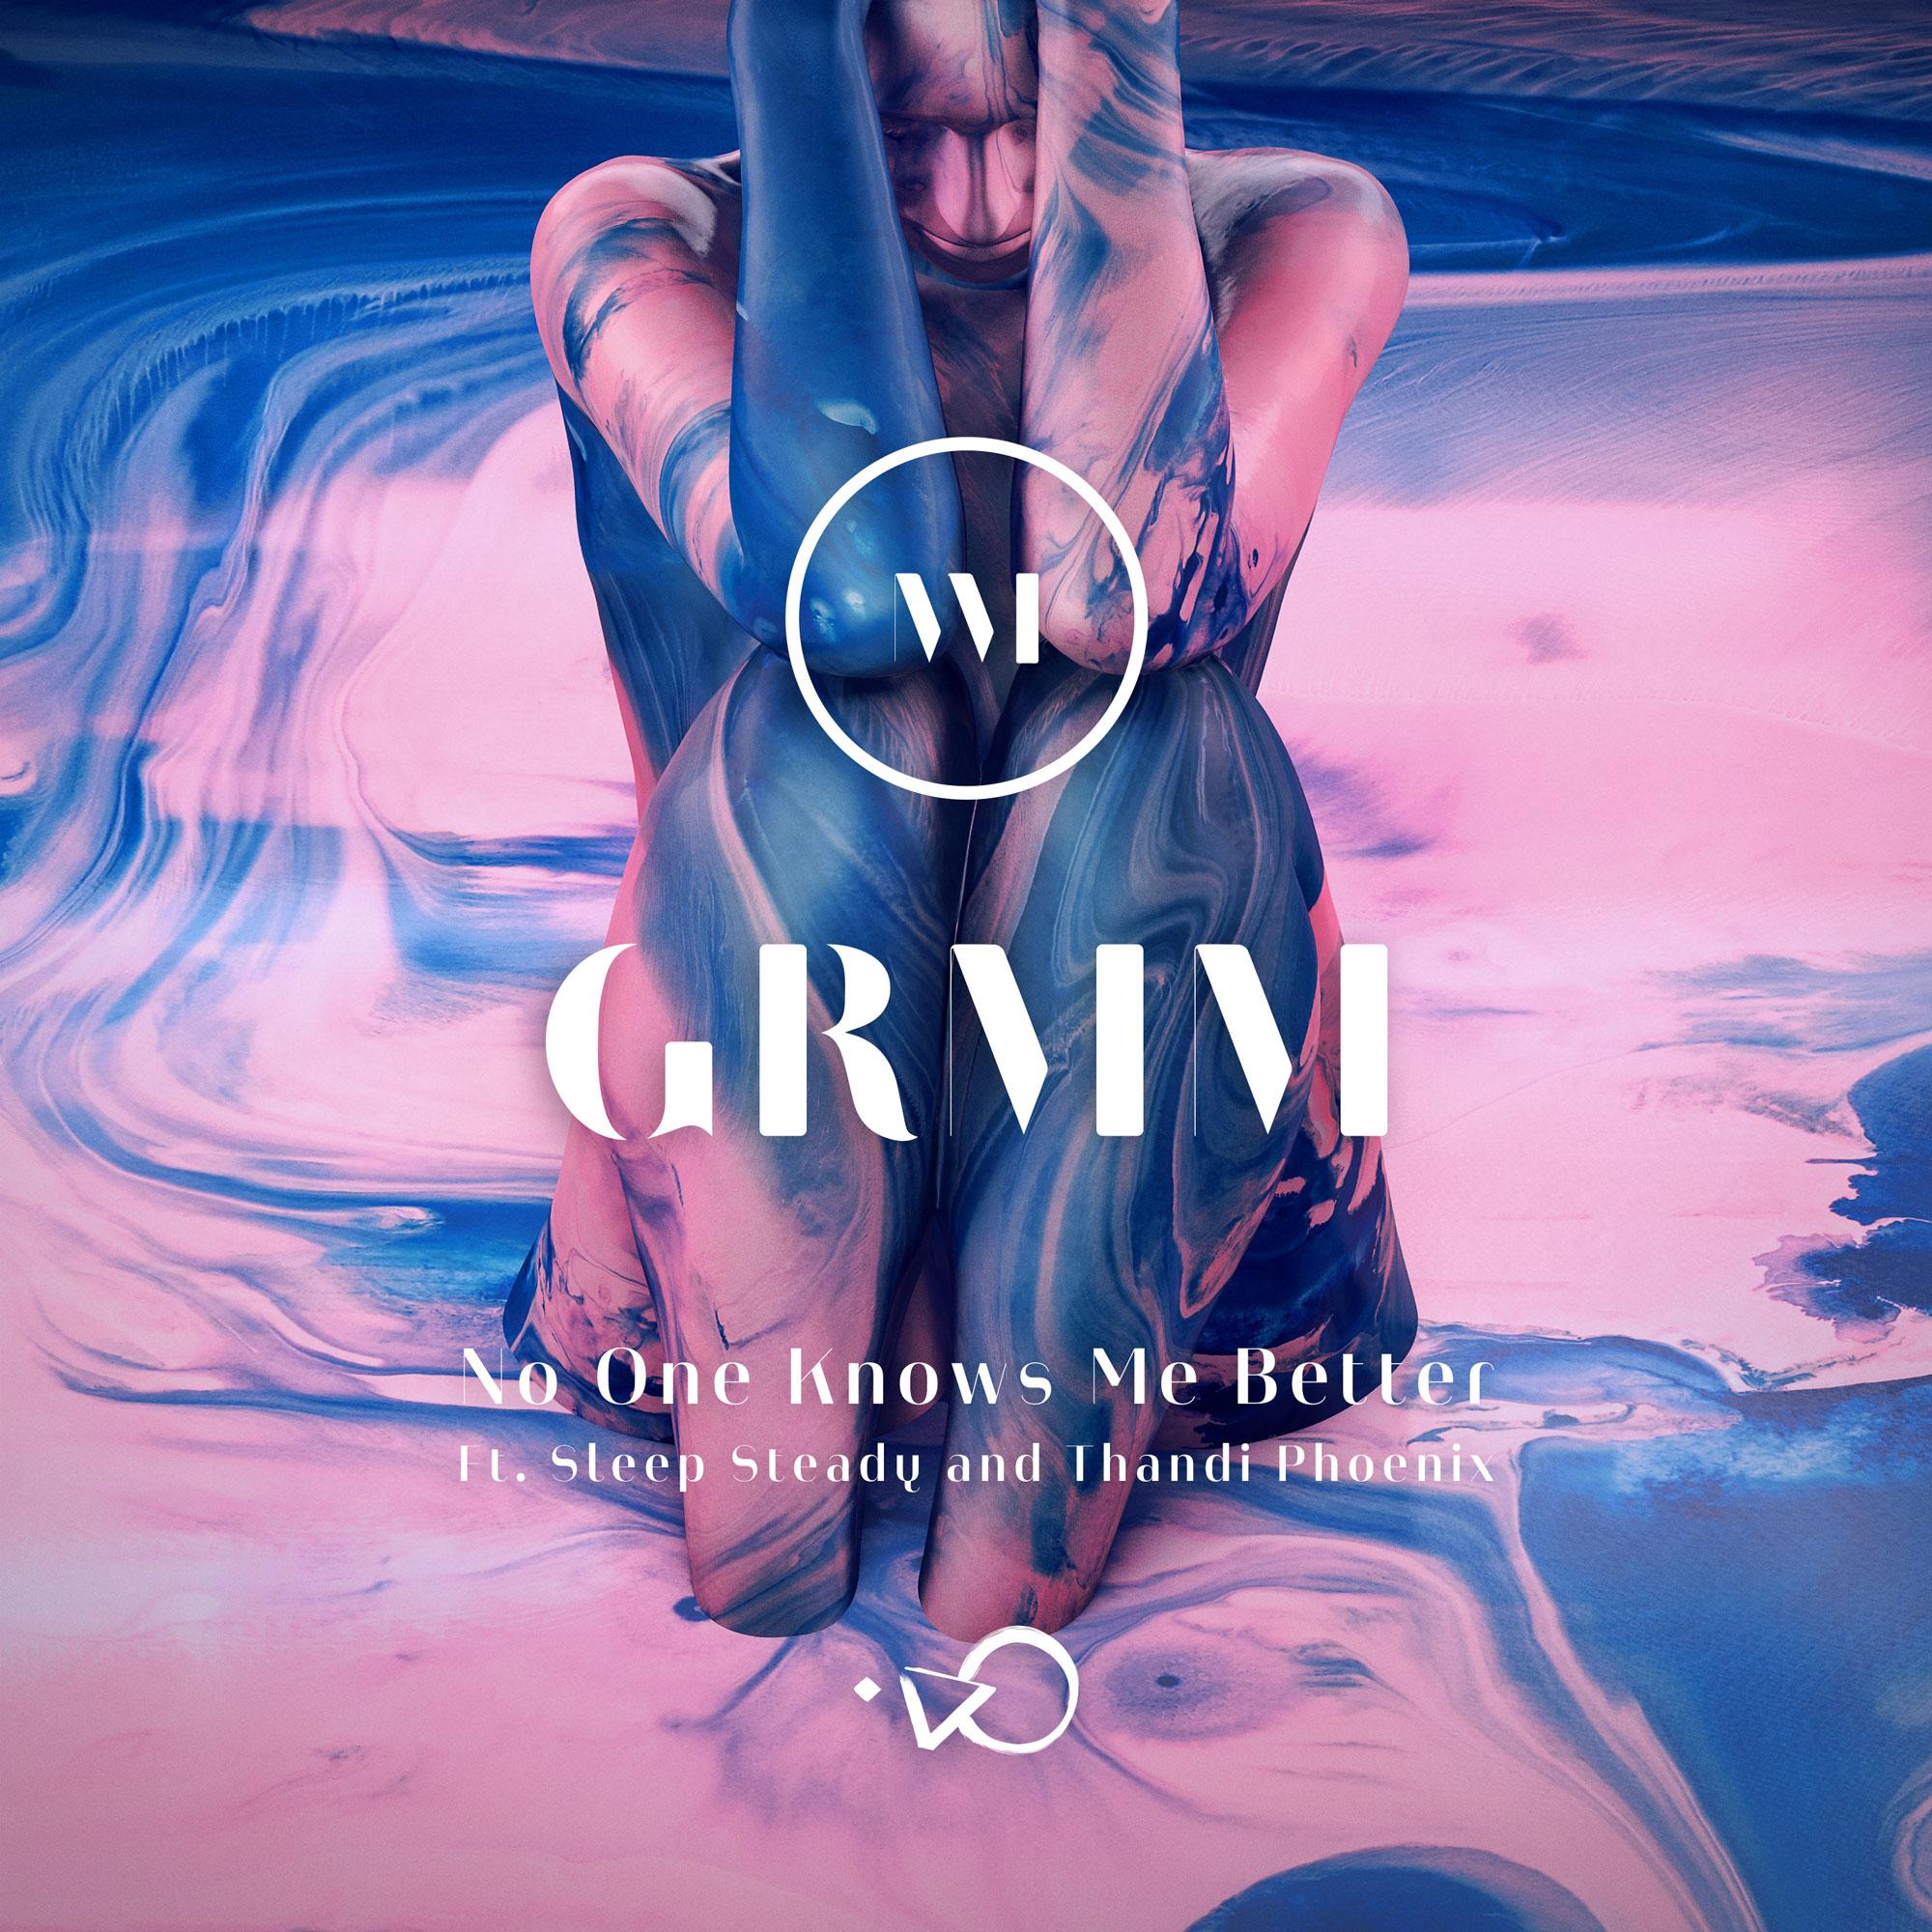 GRMM-NKMB.jpg